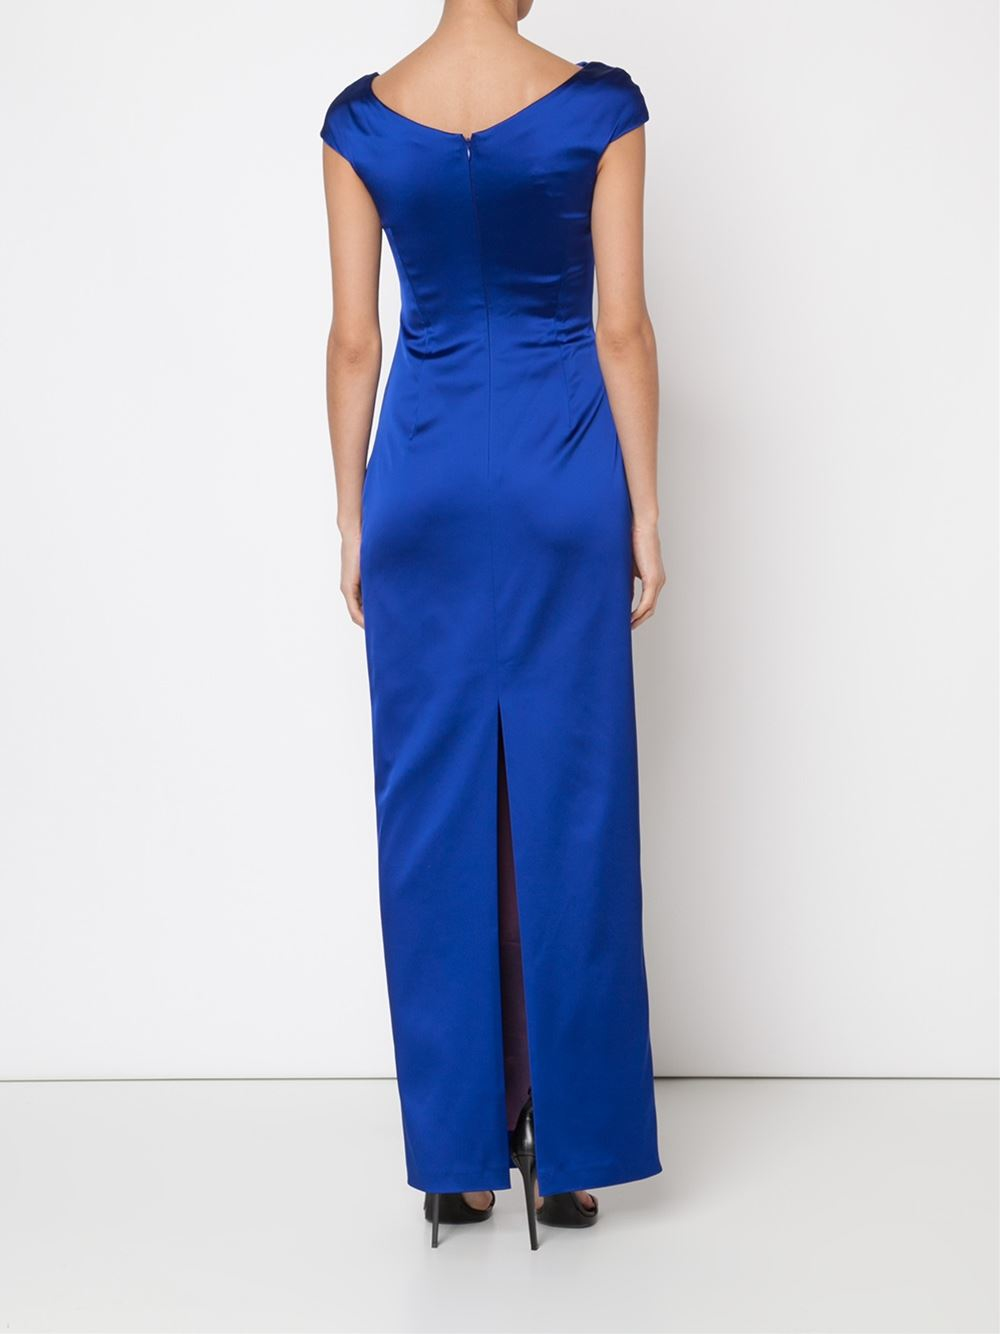 talbot runhof 39 romania 39 dress in blue lyst. Black Bedroom Furniture Sets. Home Design Ideas